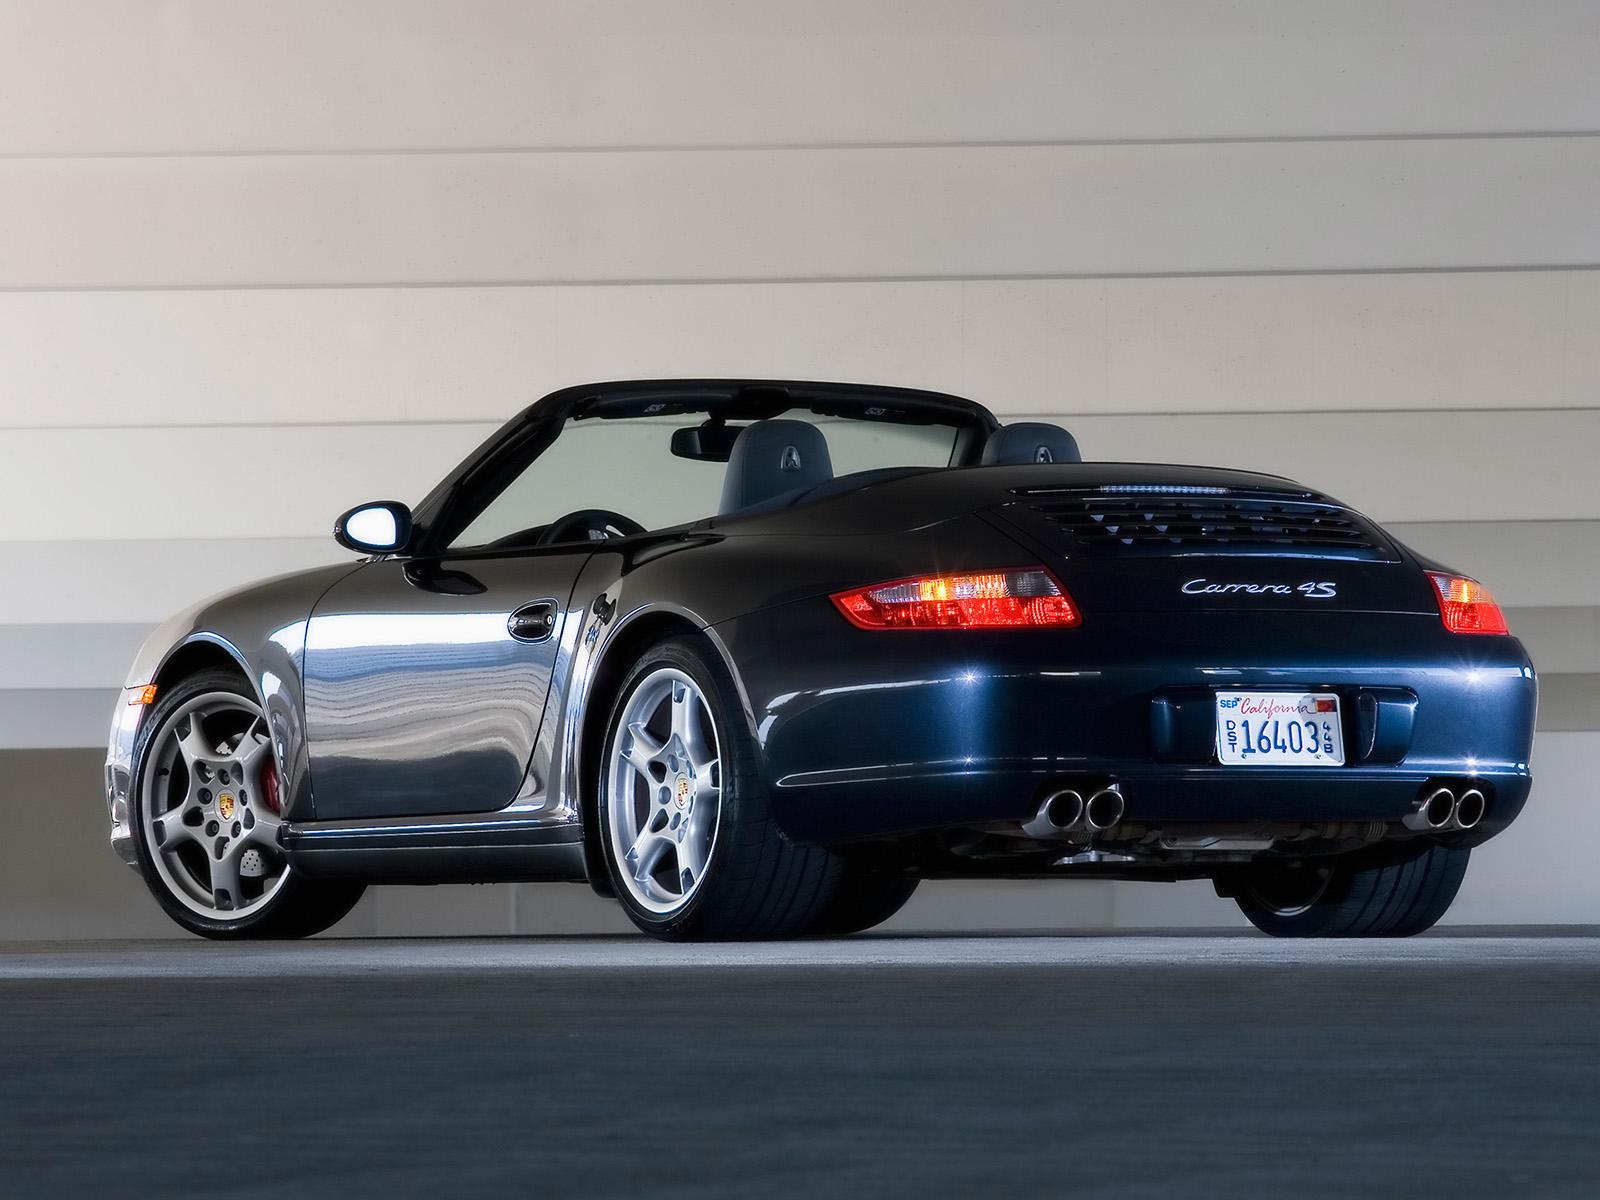 porsche 911 carrera 4s cabriolet picture 43917 porsche photo gallery. Black Bedroom Furniture Sets. Home Design Ideas